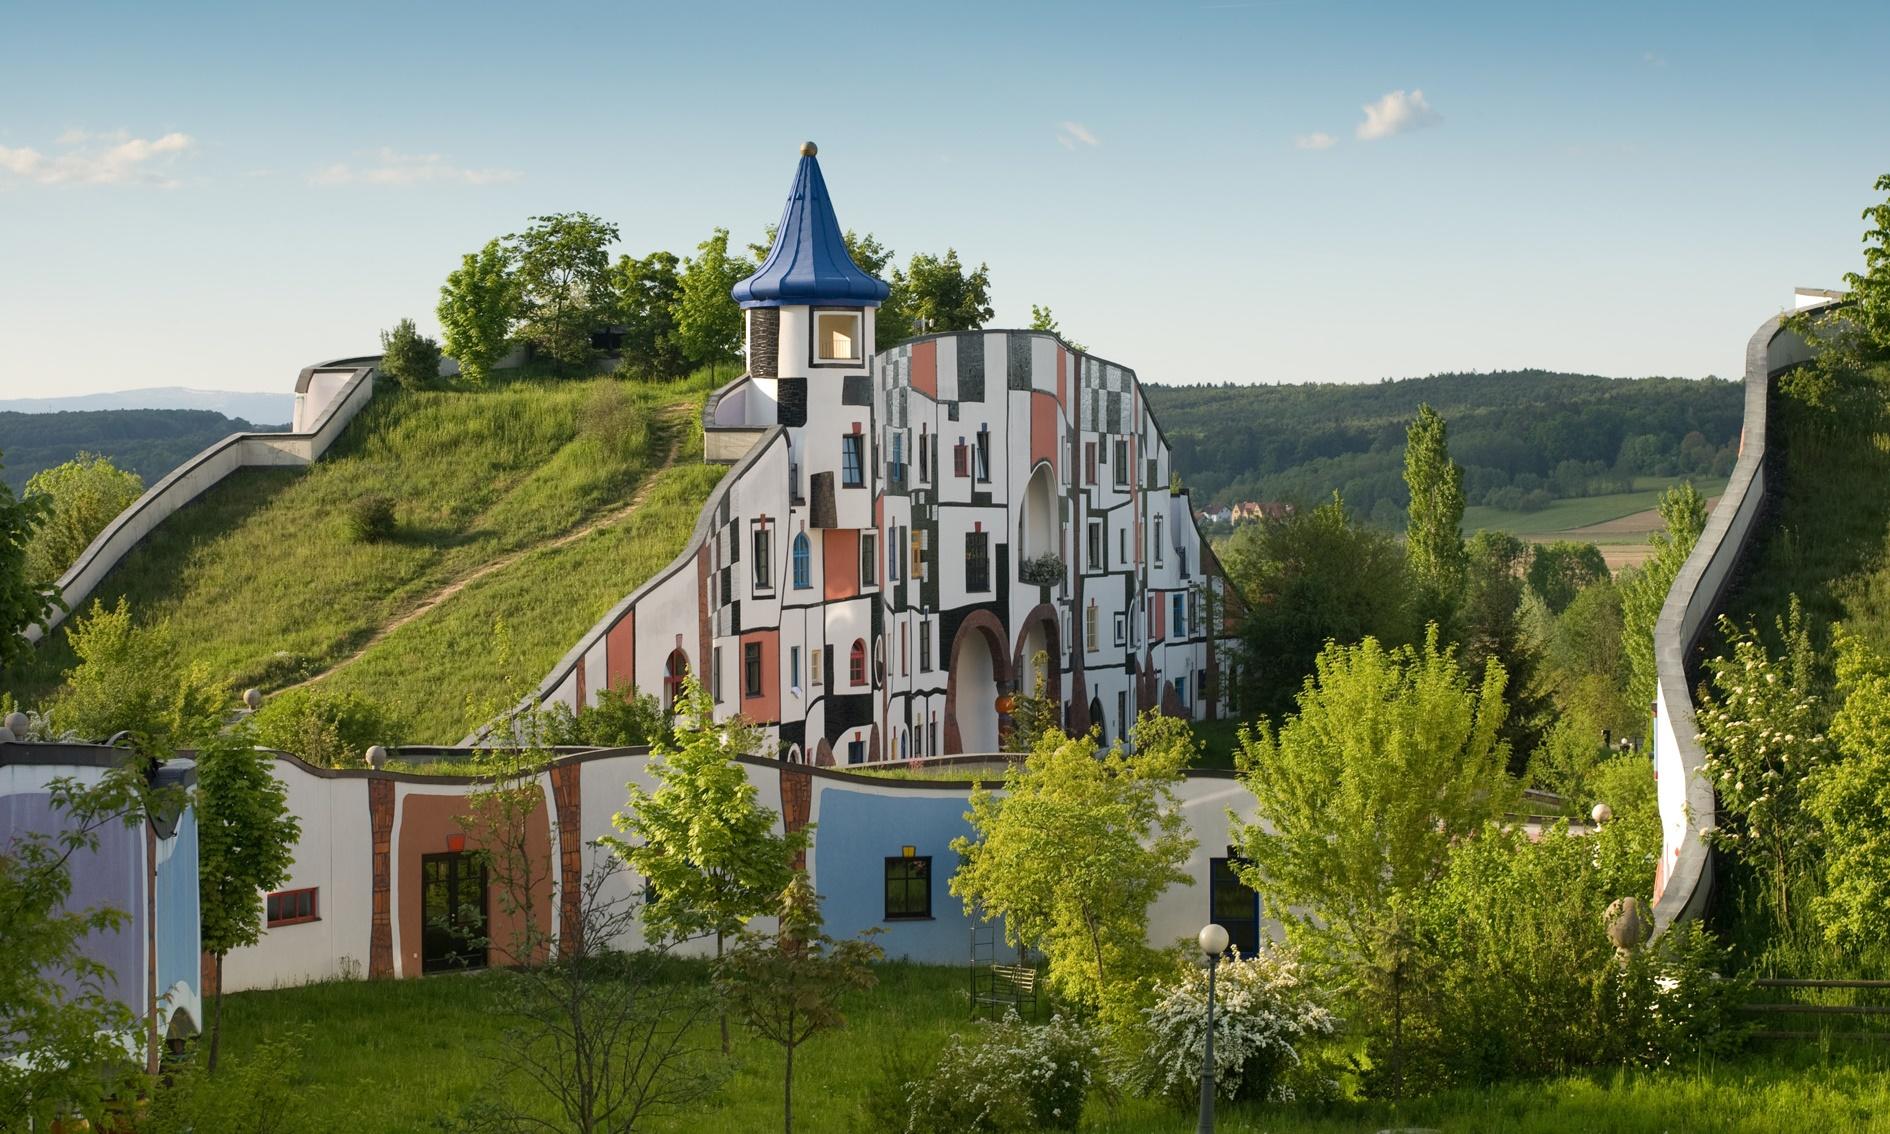 Hotel_Therme_Rogner_Bad_Blumau_Kunsthaus